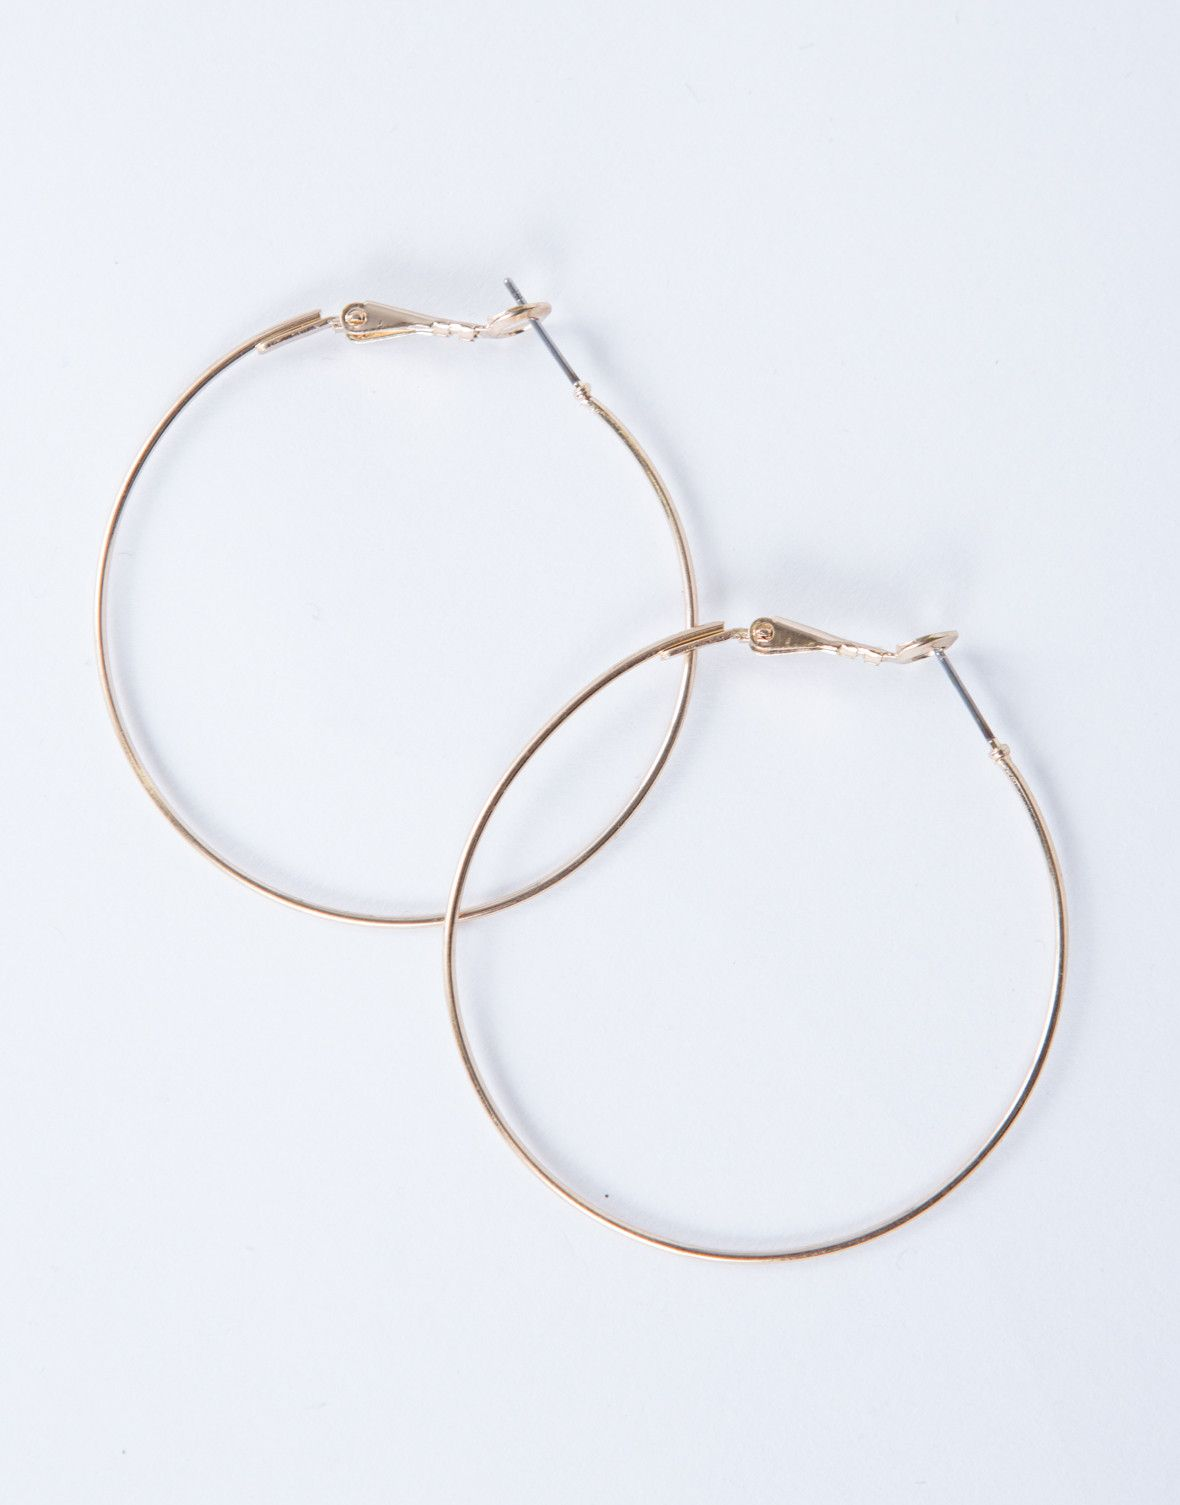 bc5a4bec0 Shiny Thin Hoop Earrings |